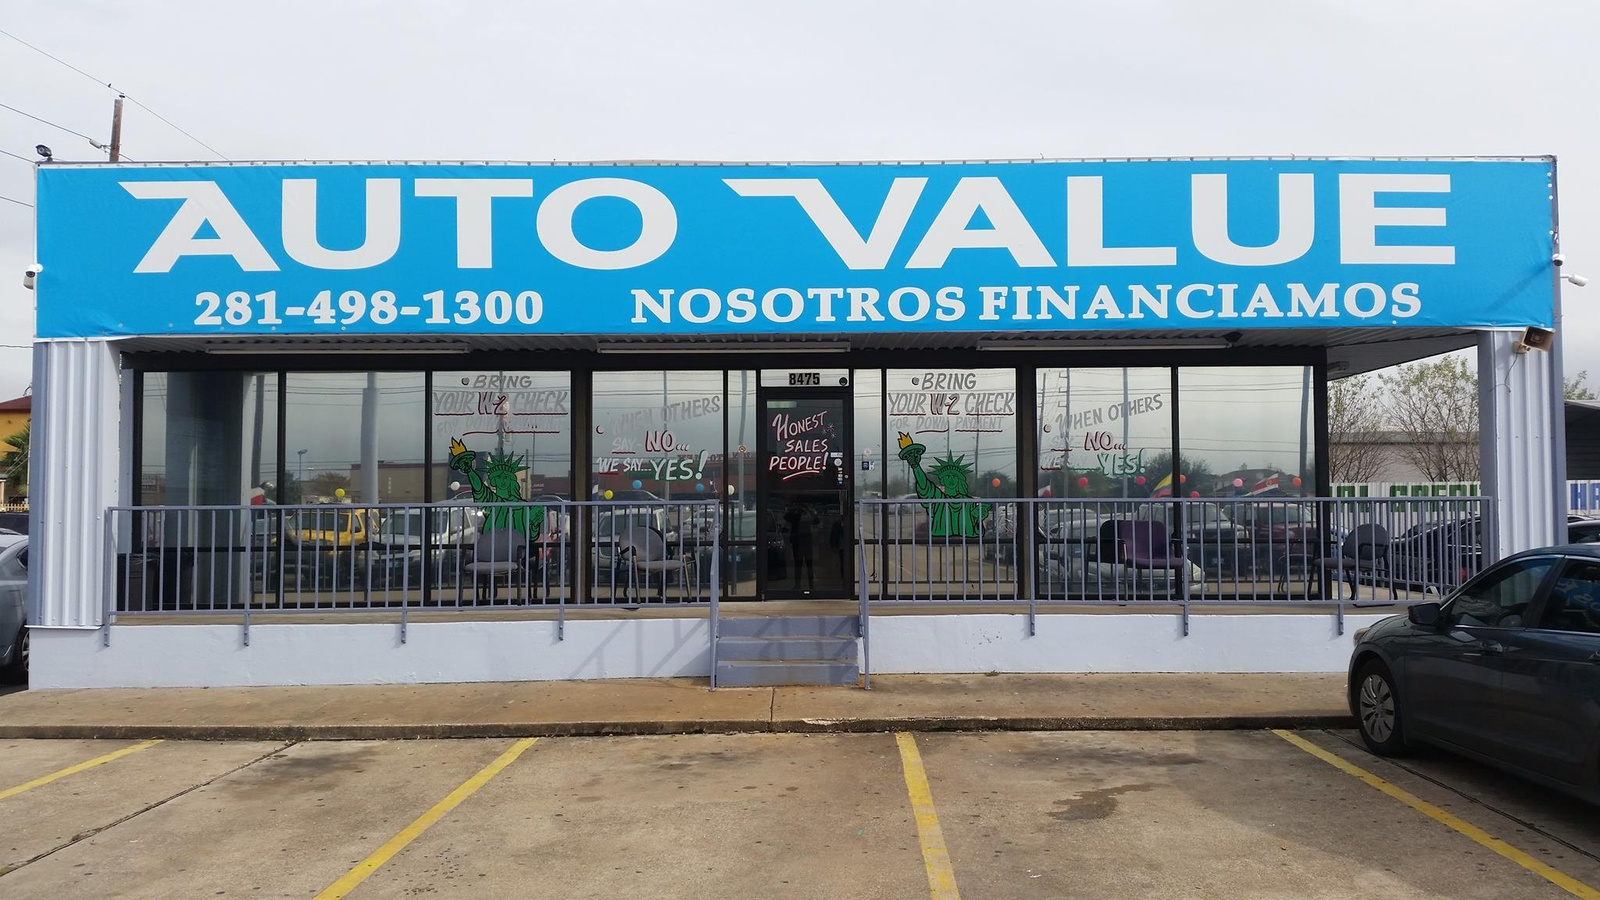 Auto Value Finance - Houston, TX: Read Consumer reviews ...